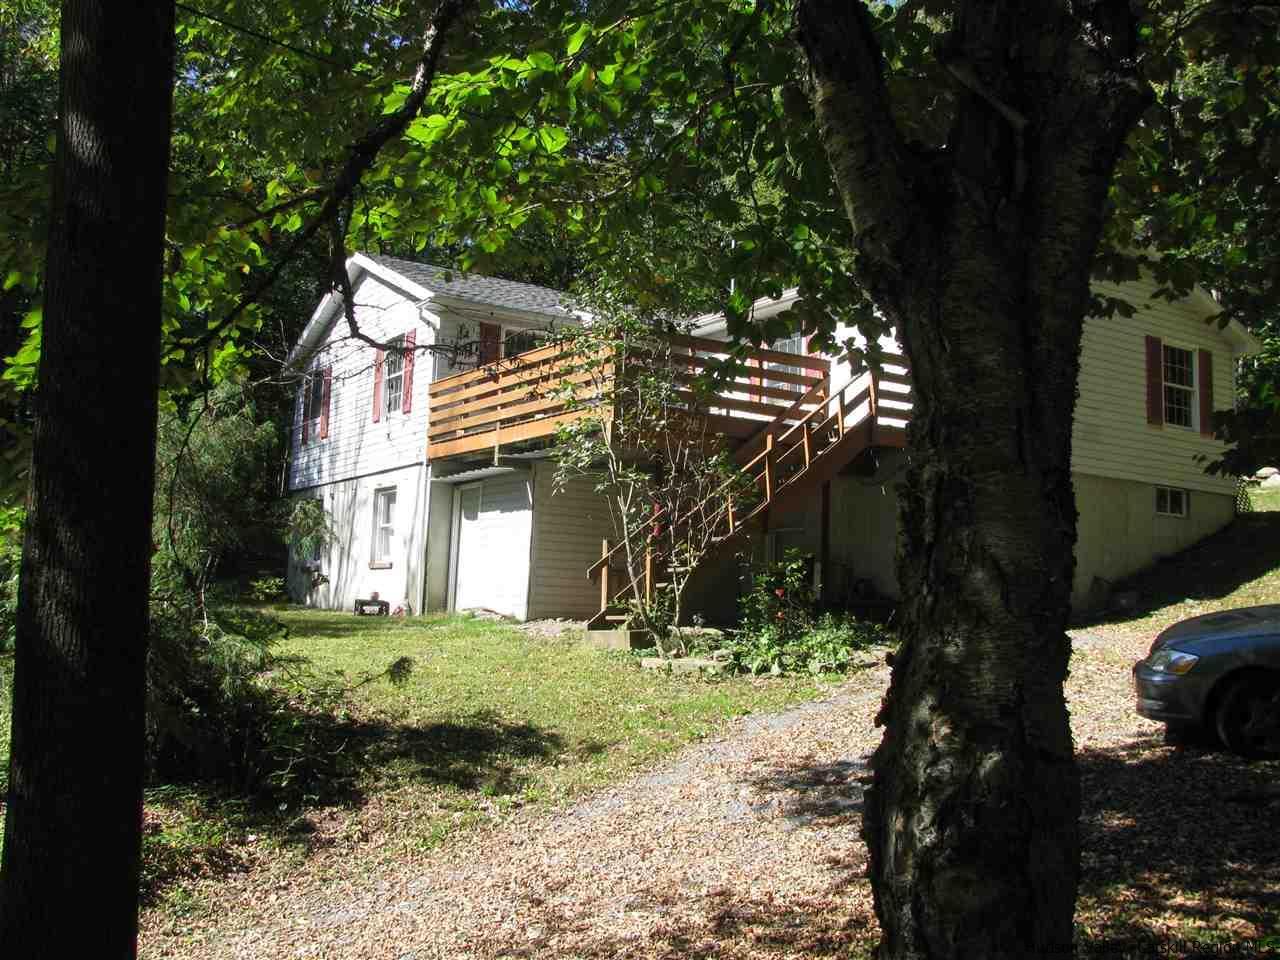 Single Family Home for Sale at 397 Diamond Notch 397 Diamond Notch Lanesville, New York 12450 United States